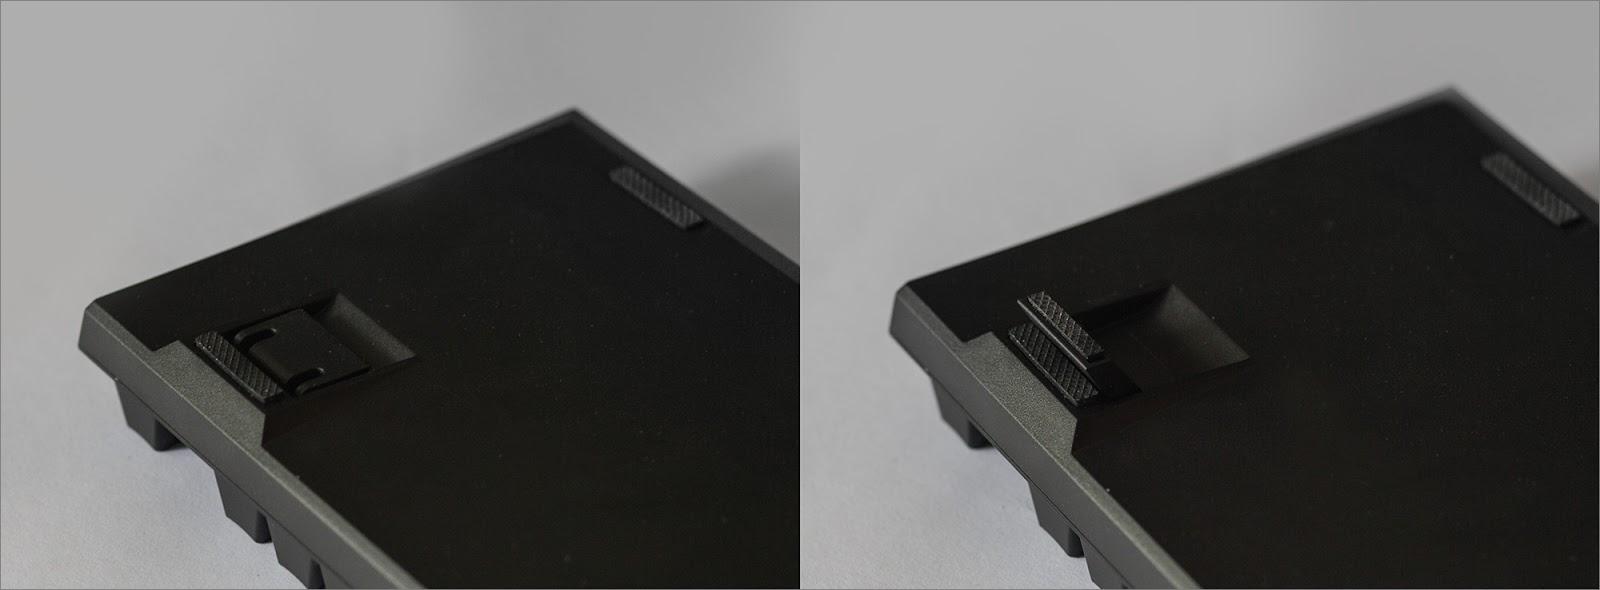 HyperX Alloy FPS — надёжность превыше всего - 12